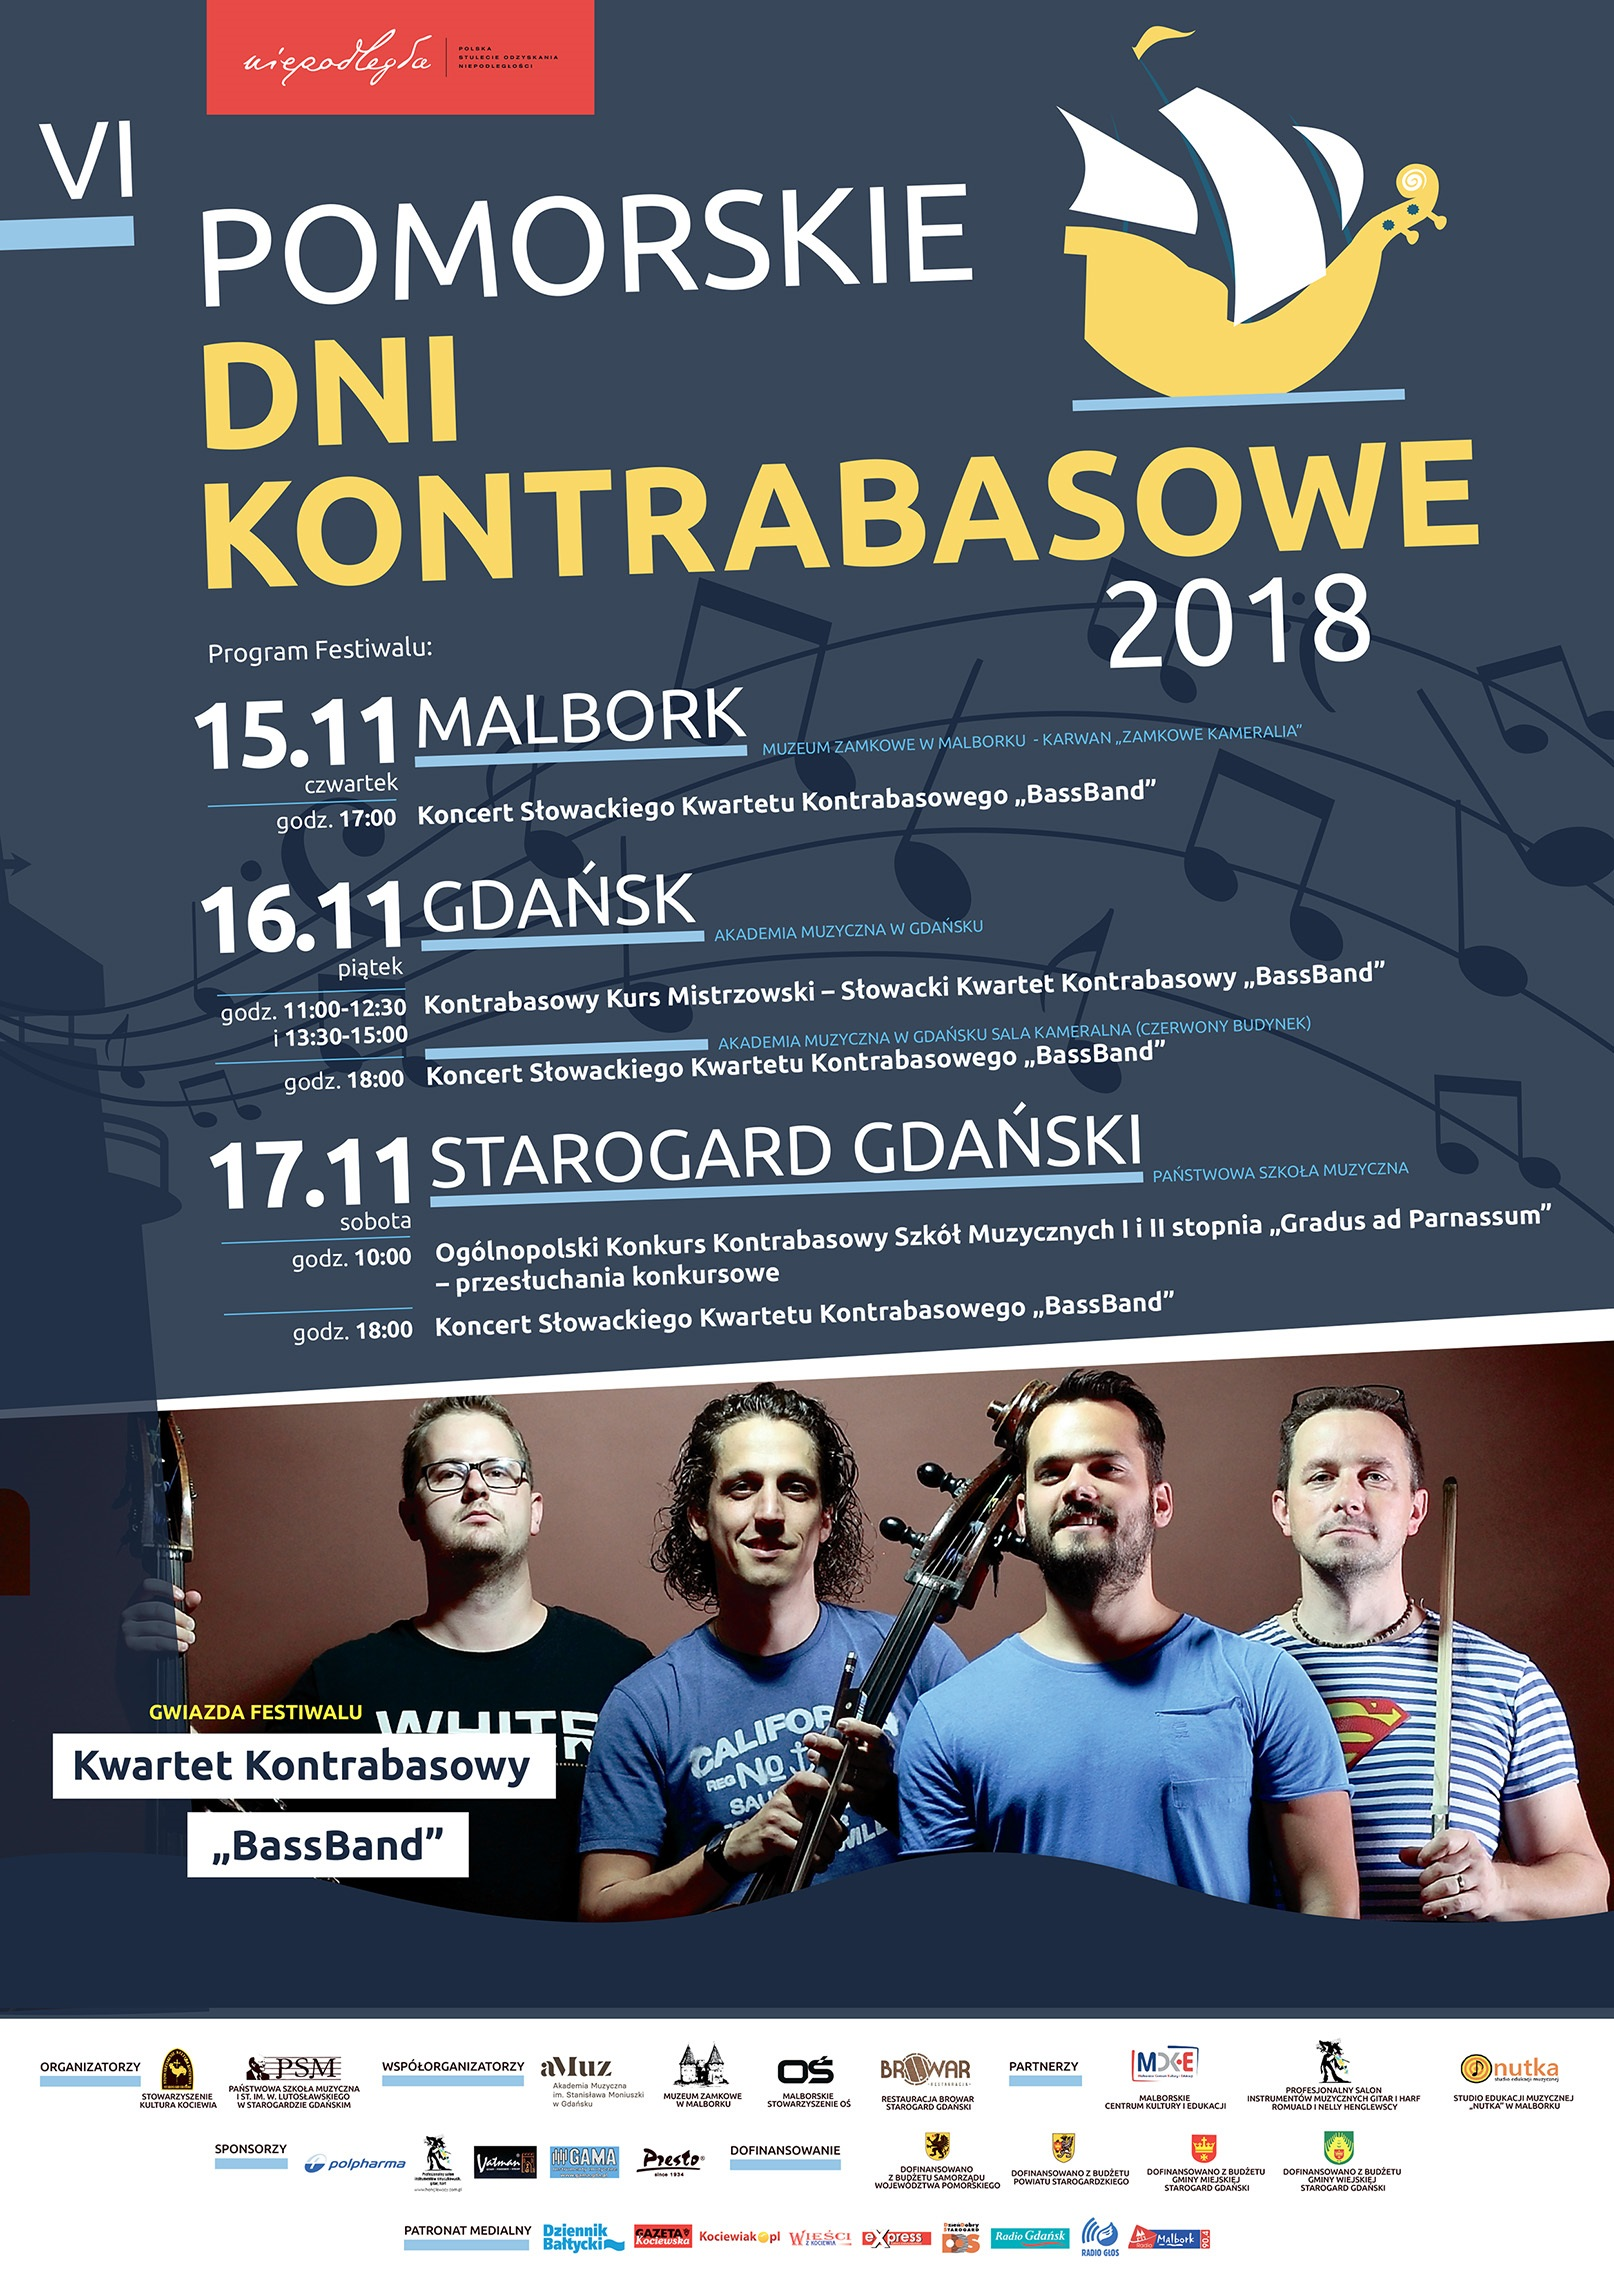 http://m.82-200.pl/2018/11/orig/pomorskie-dni-kontrabasowe-3789.jpg